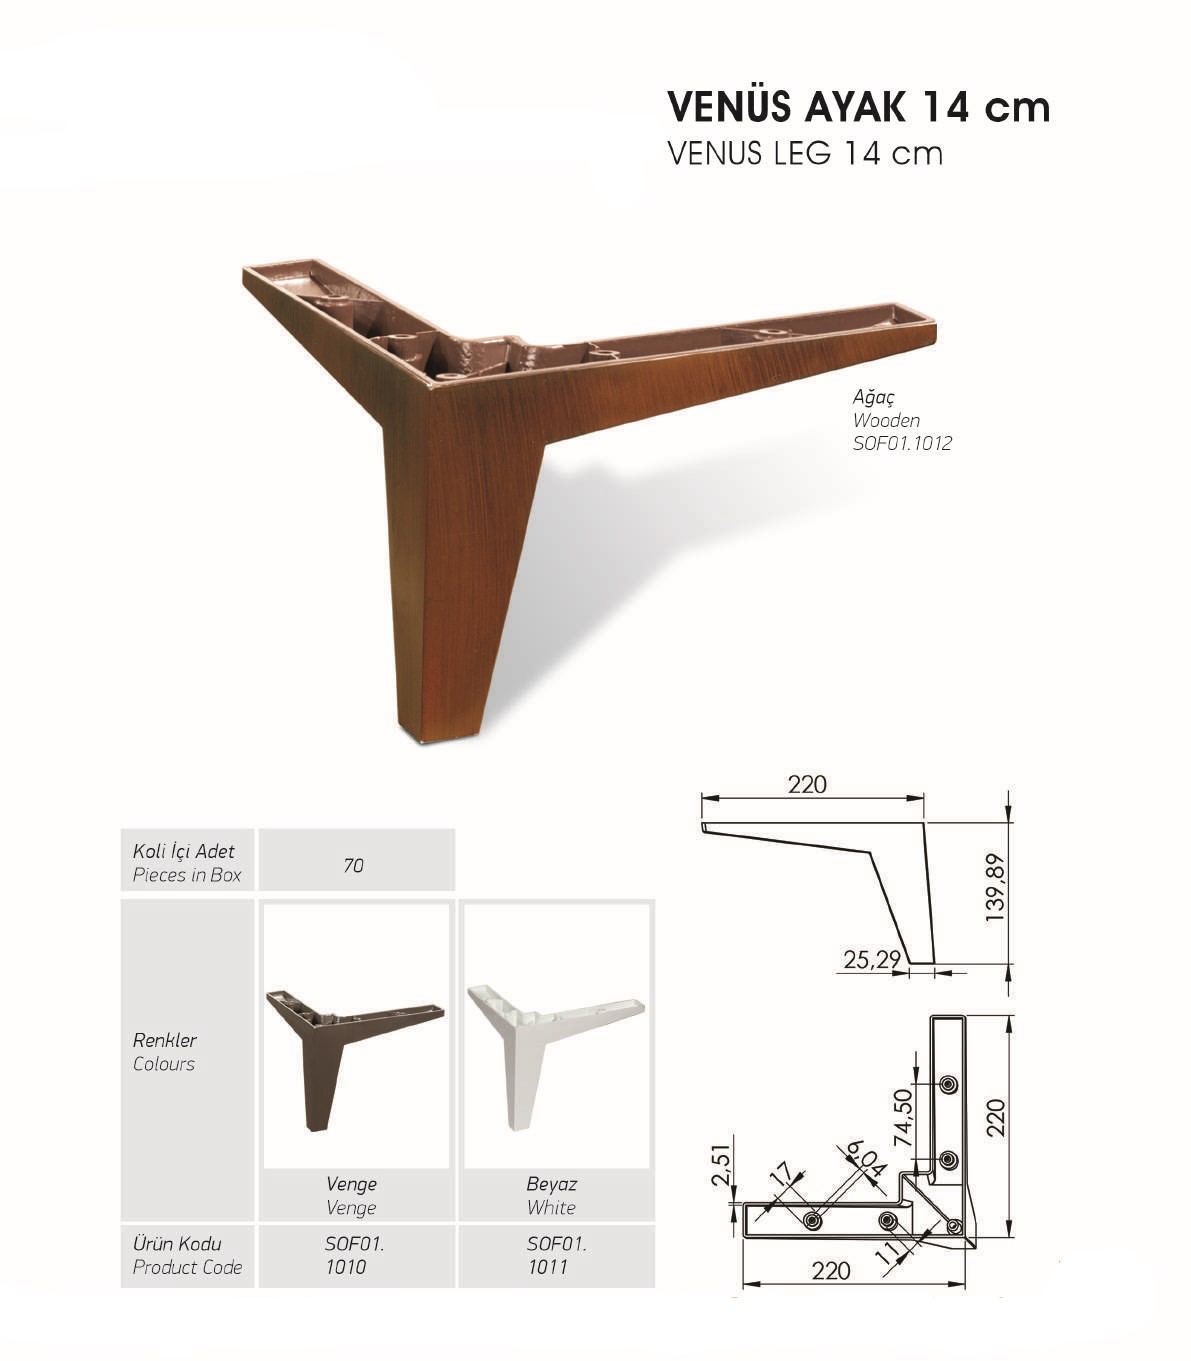 Venüs Ayak 14 cm